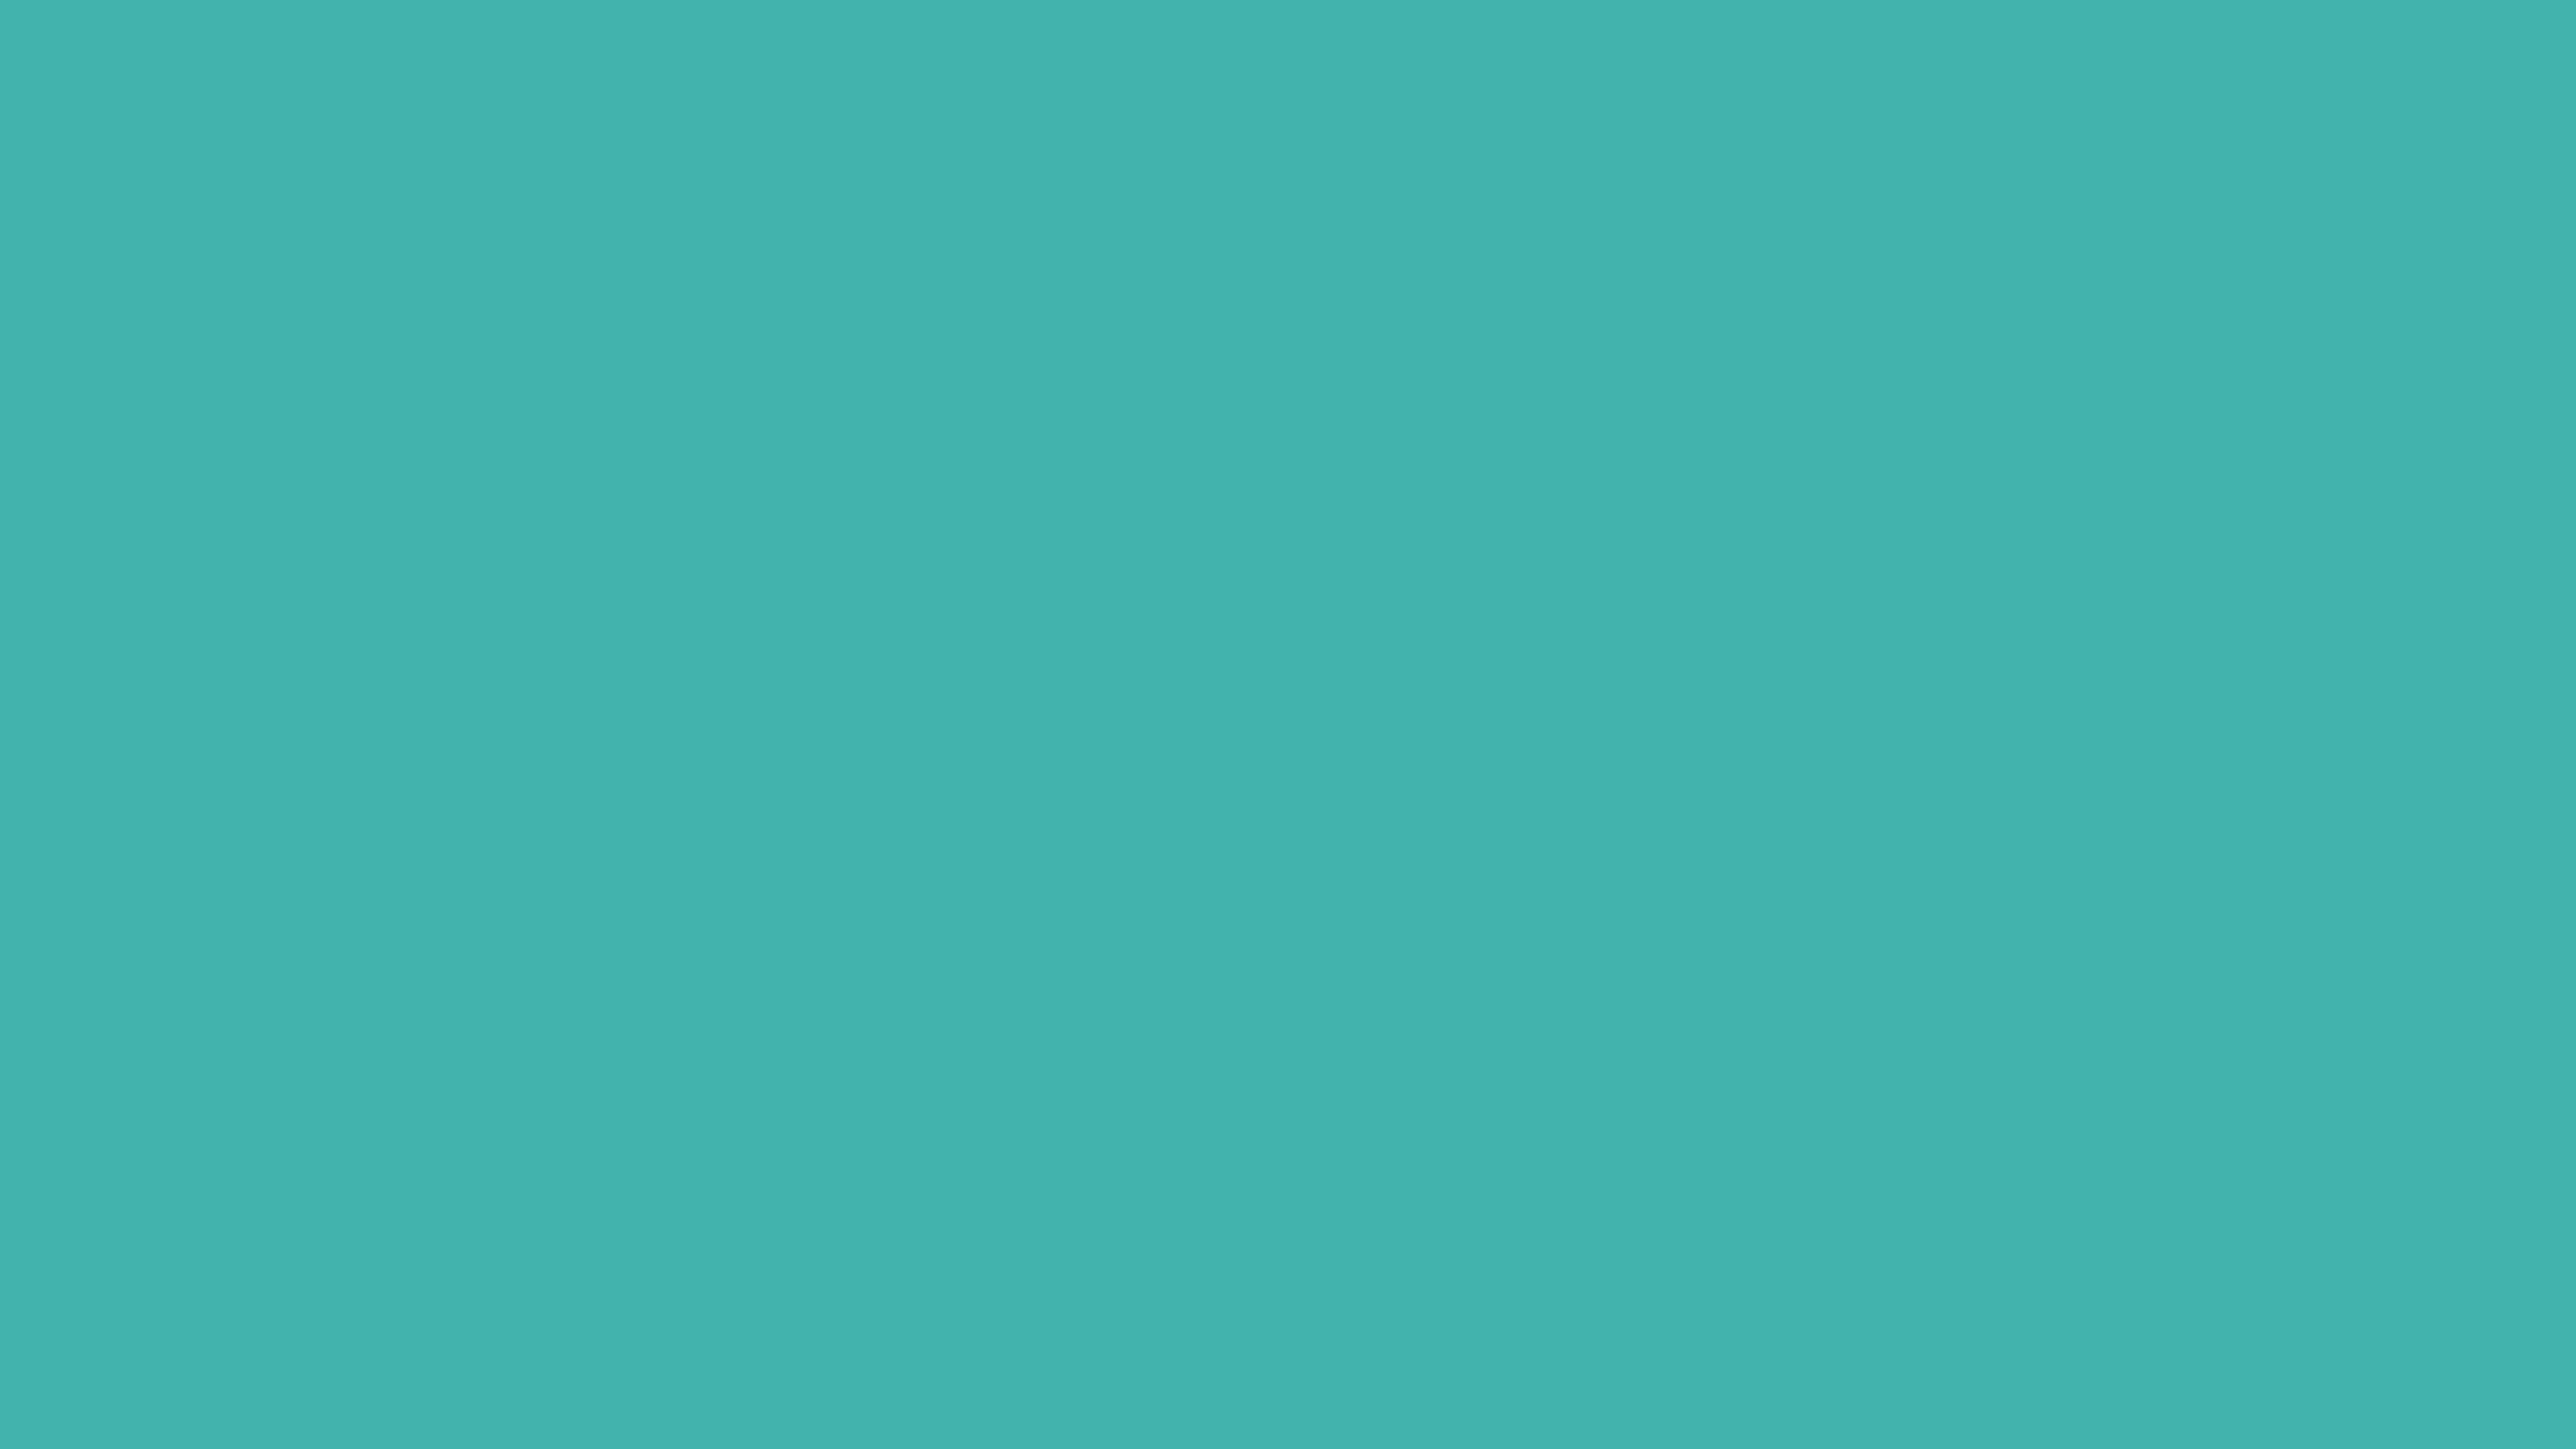 4096x2304 Verdigris Solid Color Background